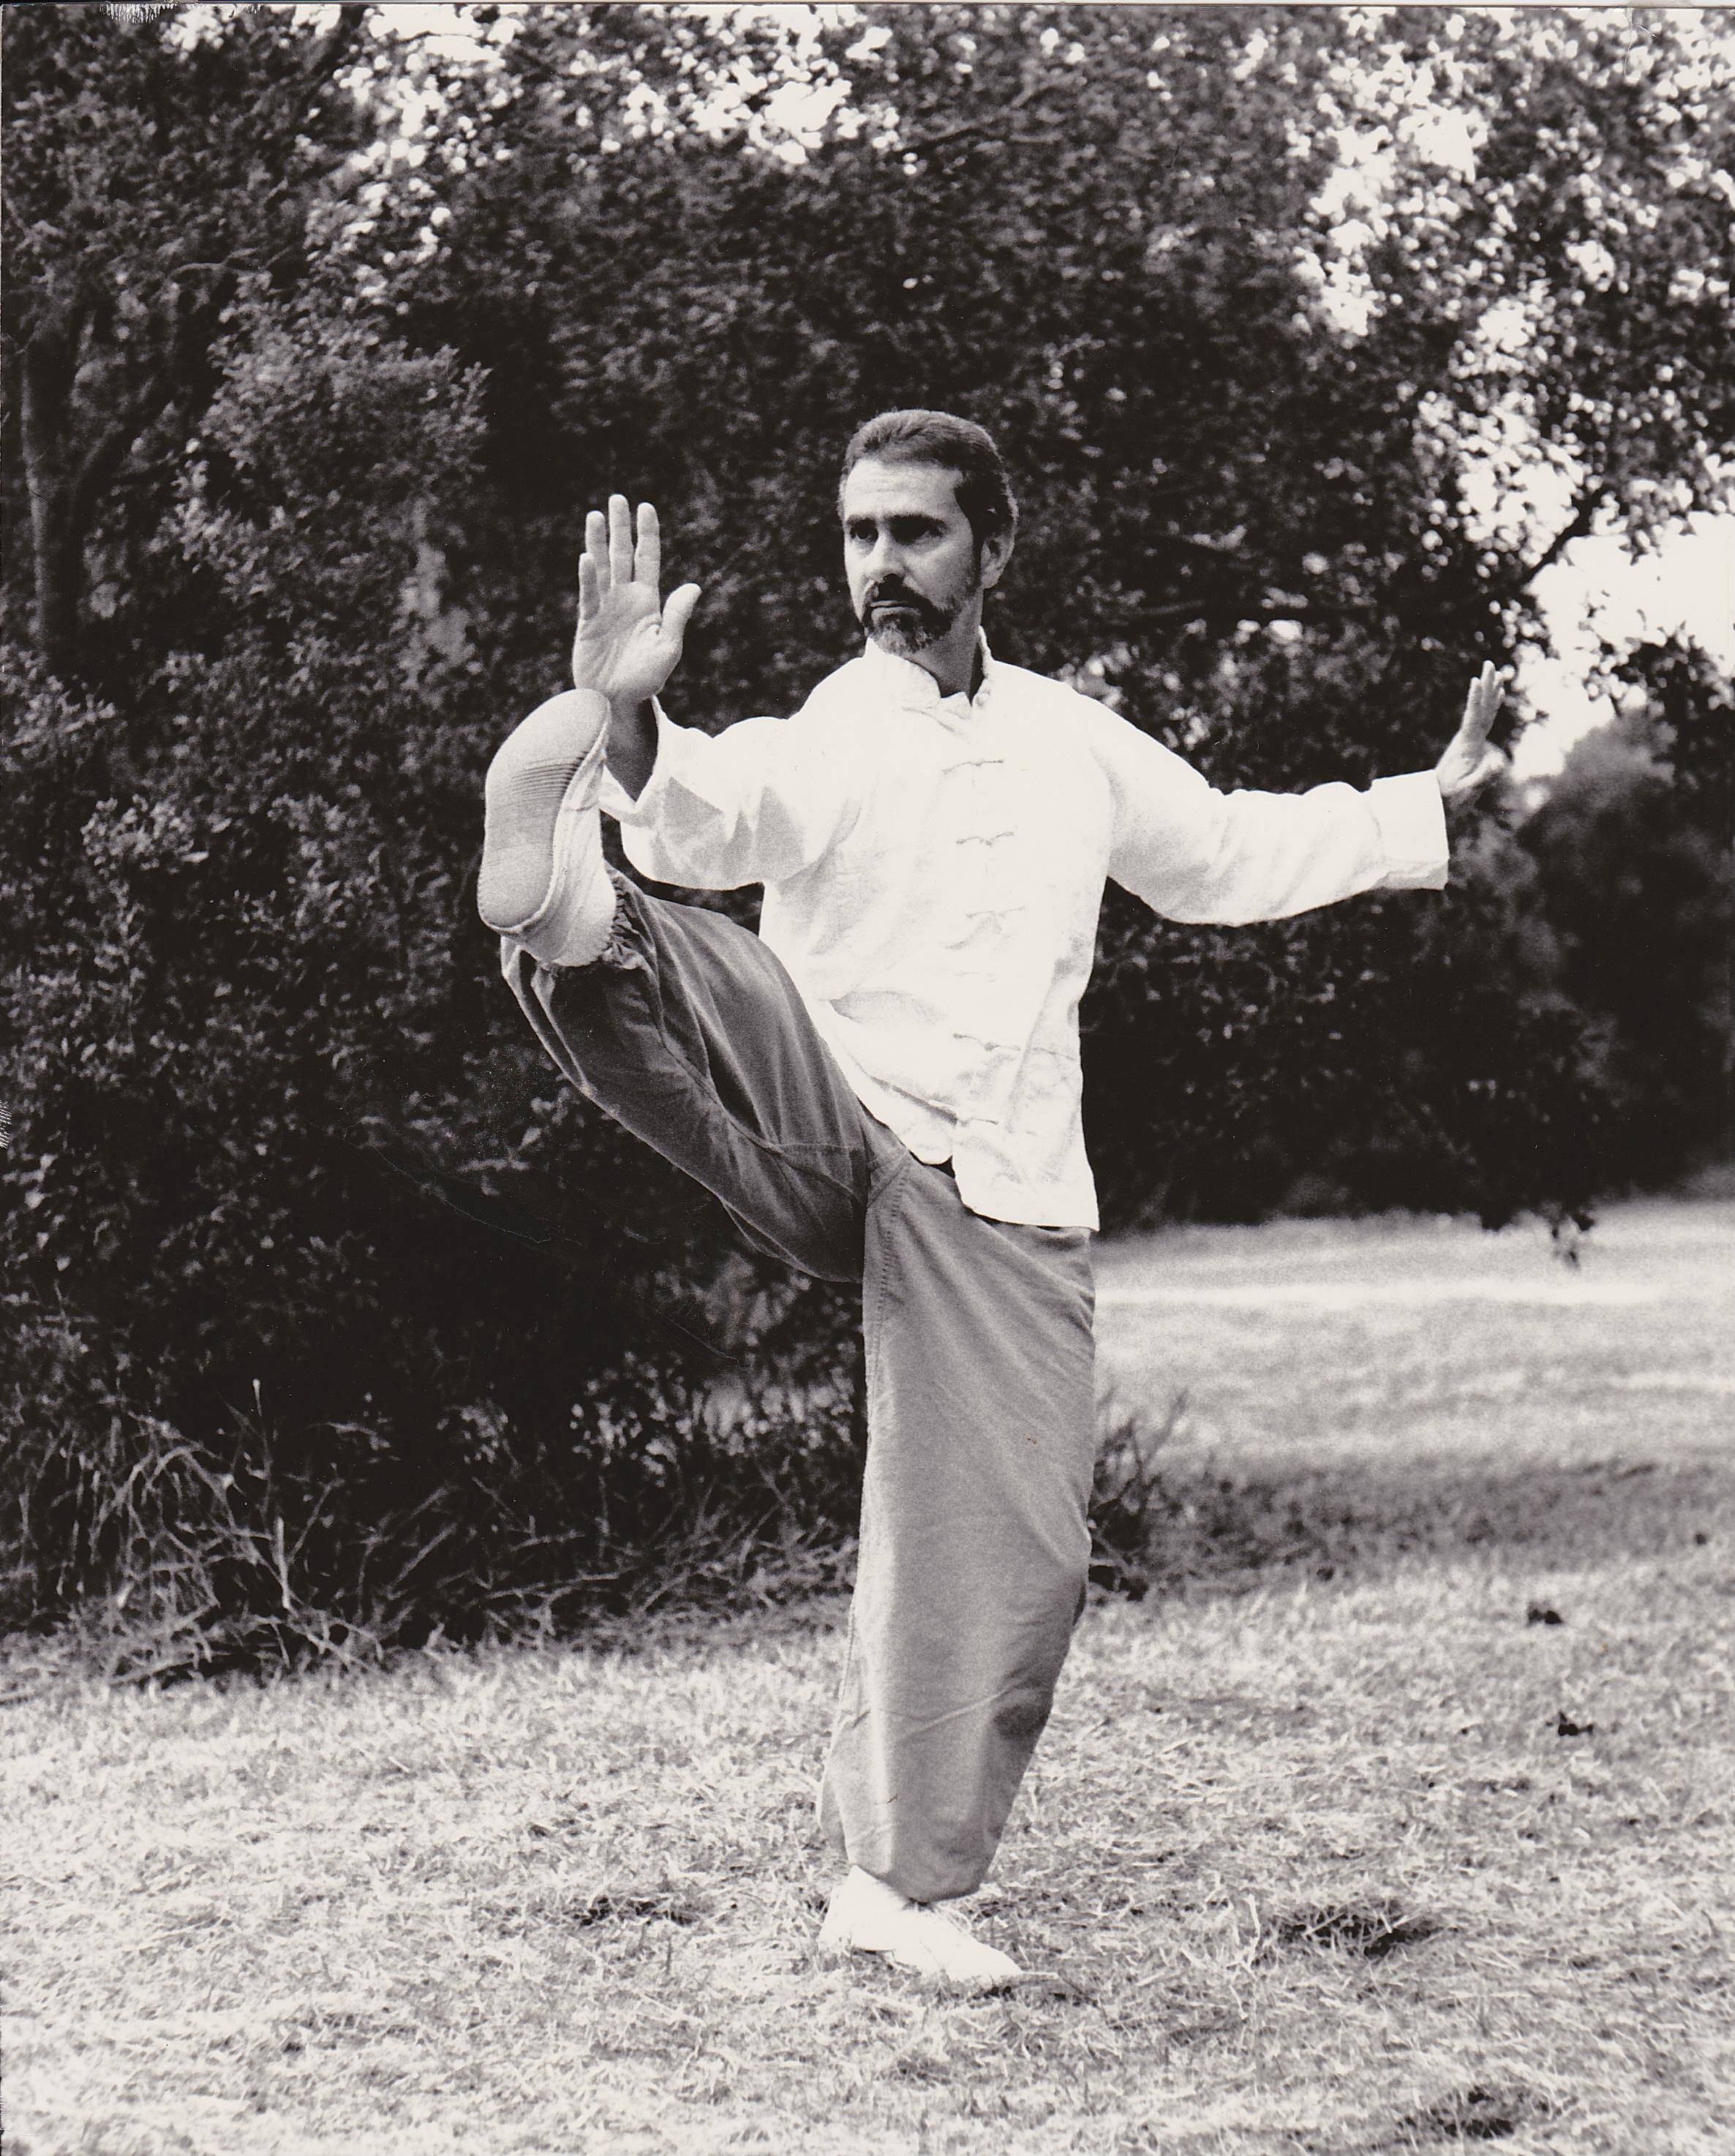 Sifu Paolillo performing Chen Tai Chi Ch'uan, early 90s